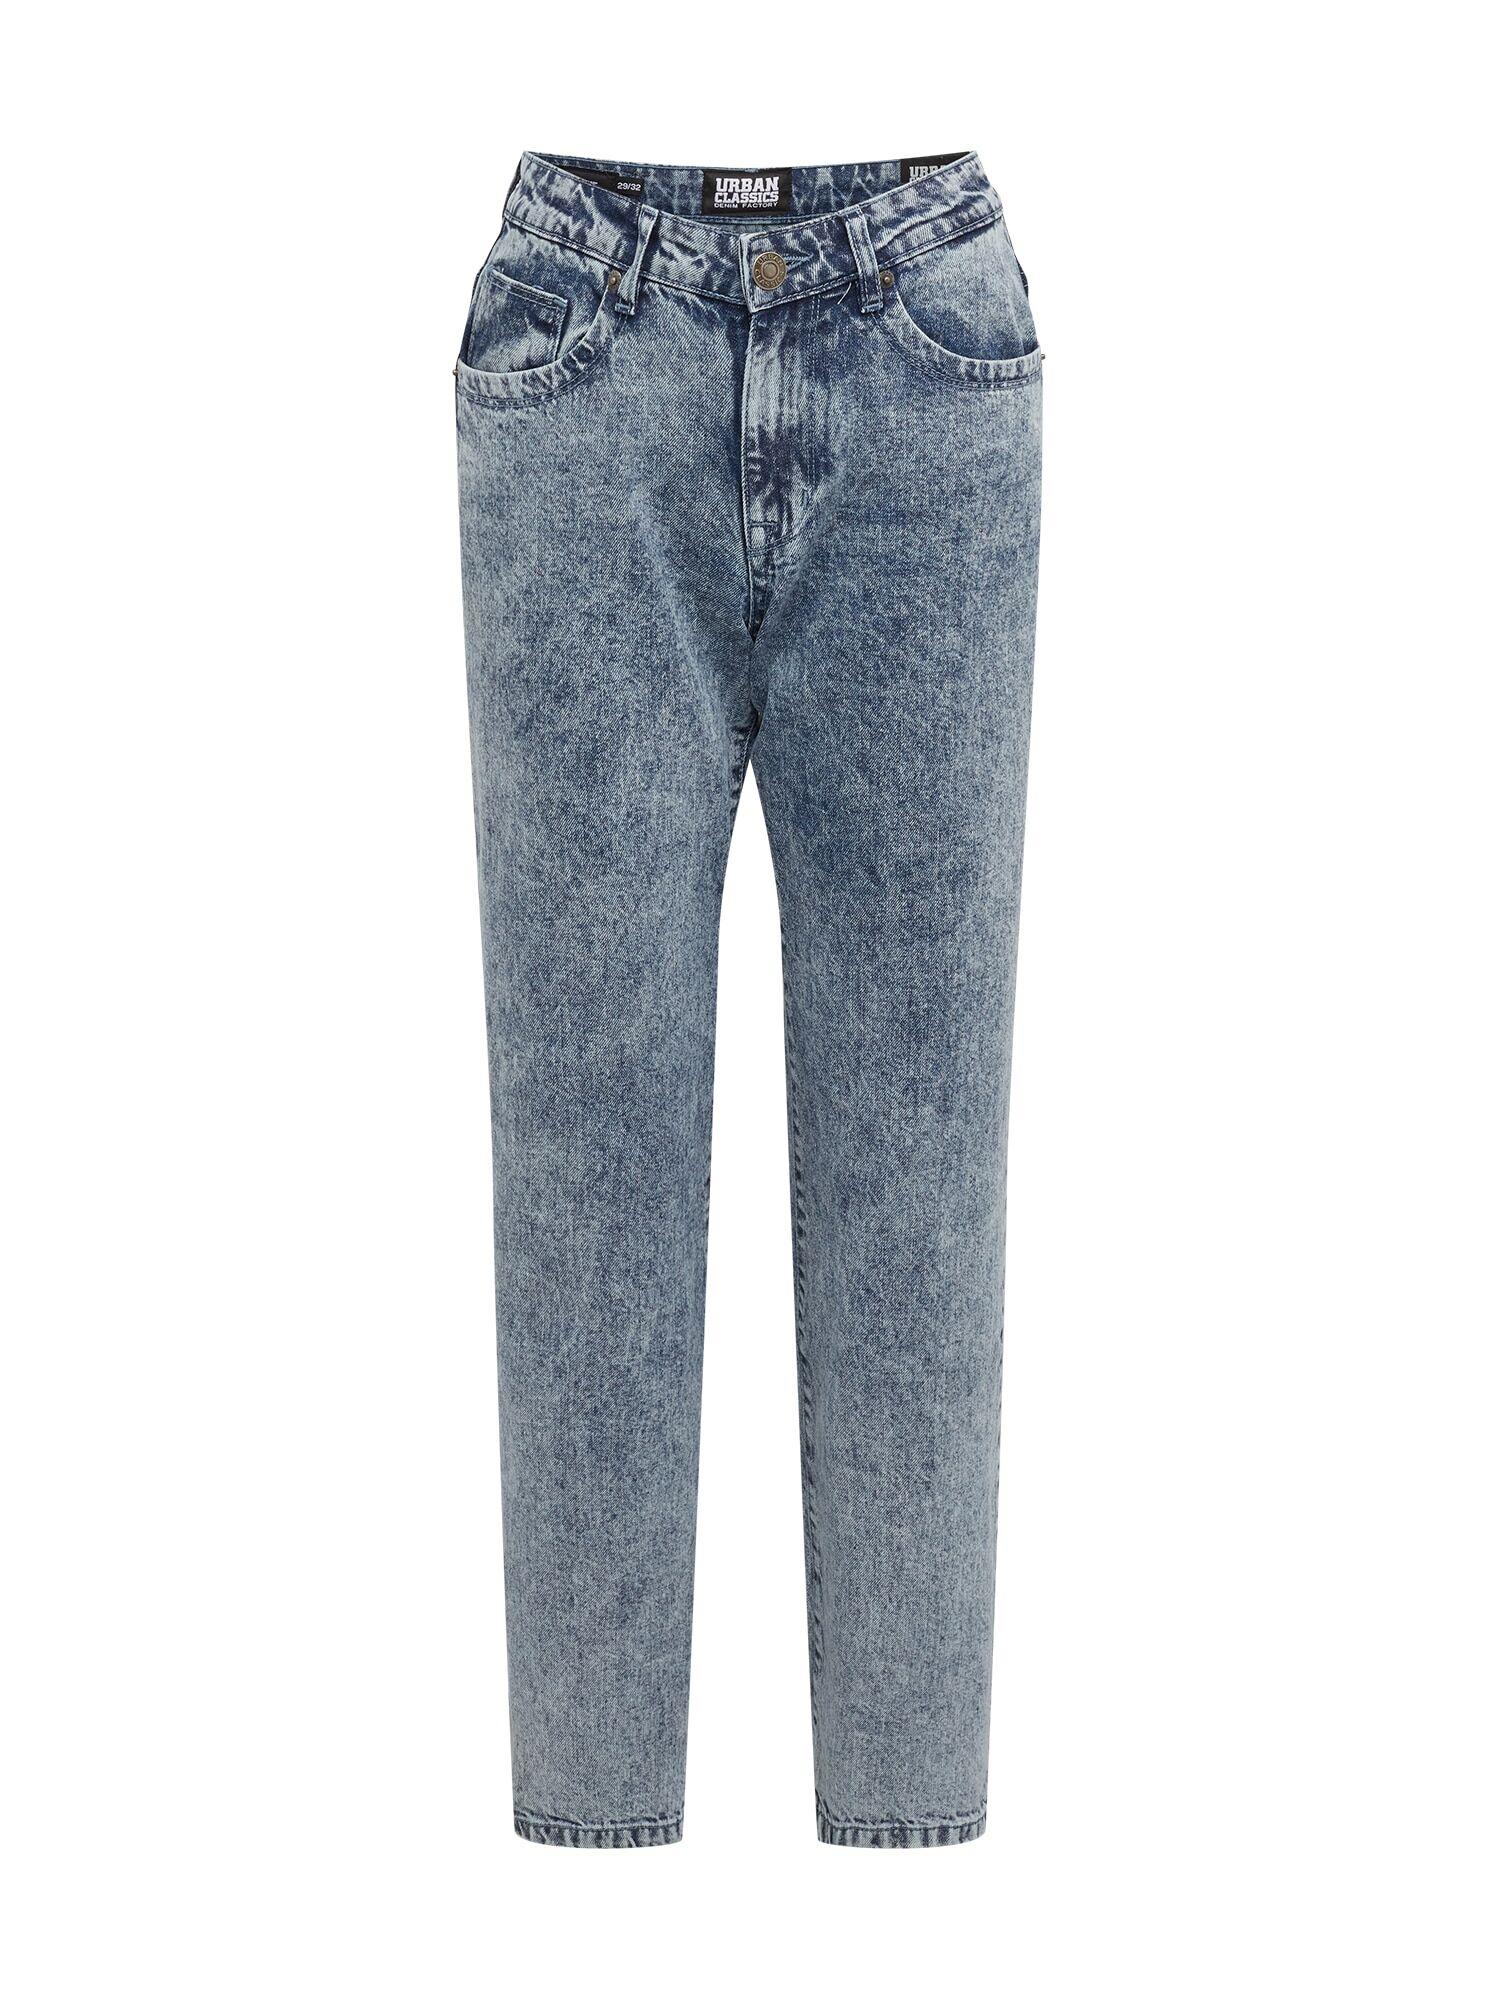 Urban Classics Jean  - Bleu - Taille: 32 - male